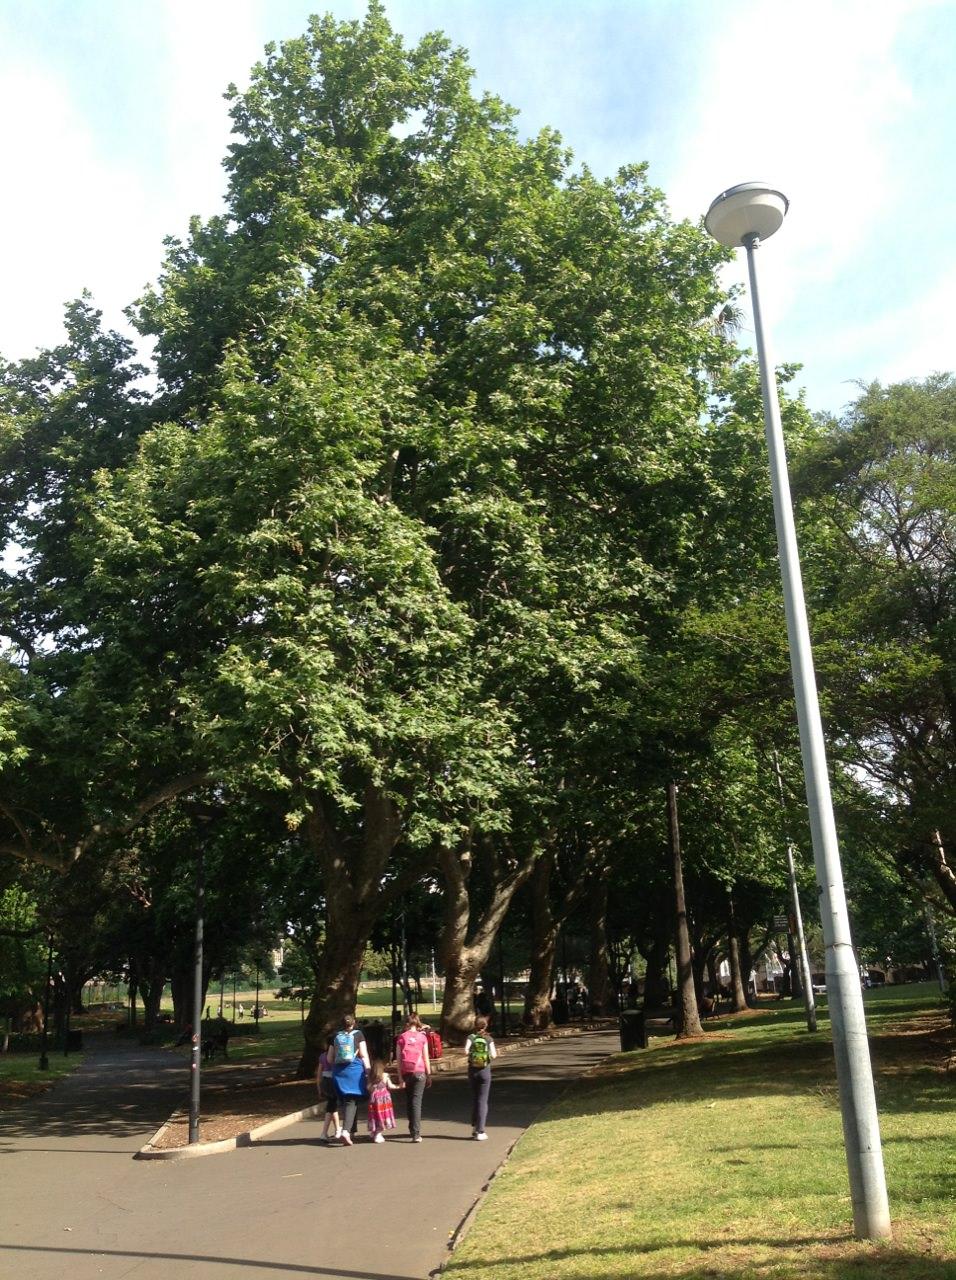 London Plane Trees